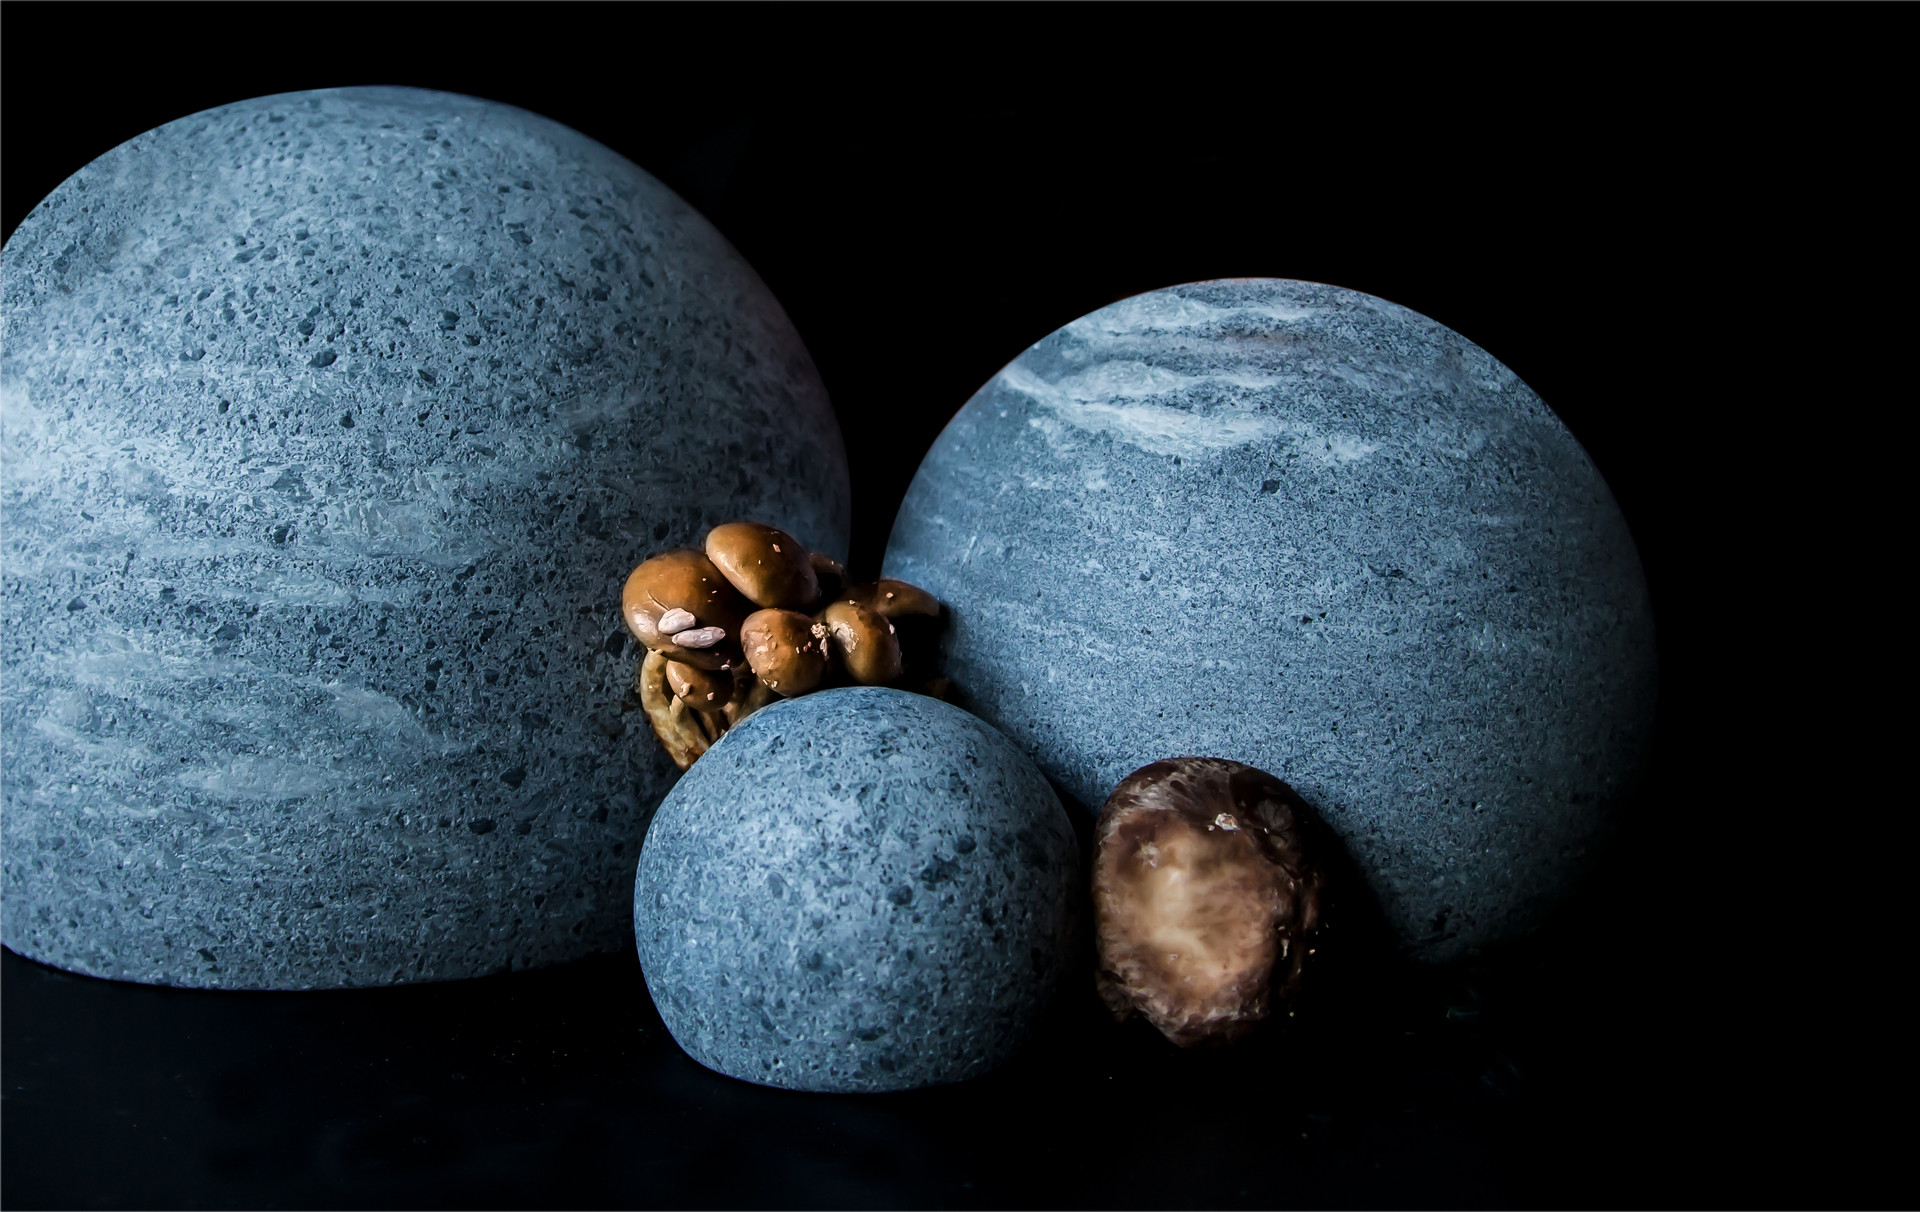 raw_finnish_stone_balls_and_mushrooms___